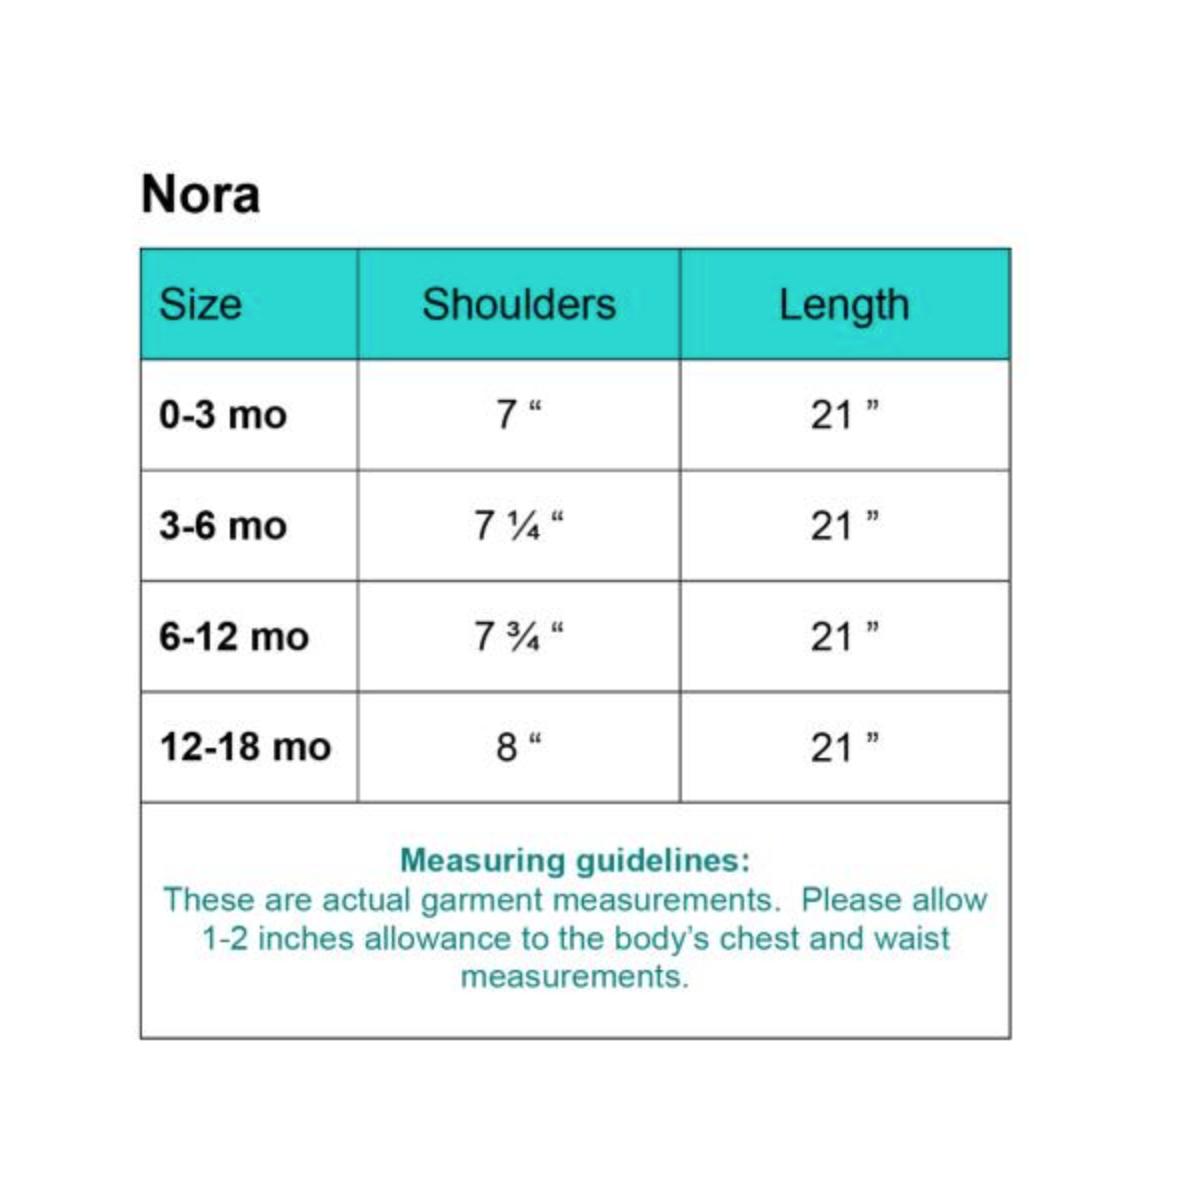 sizing-chart-nora.png